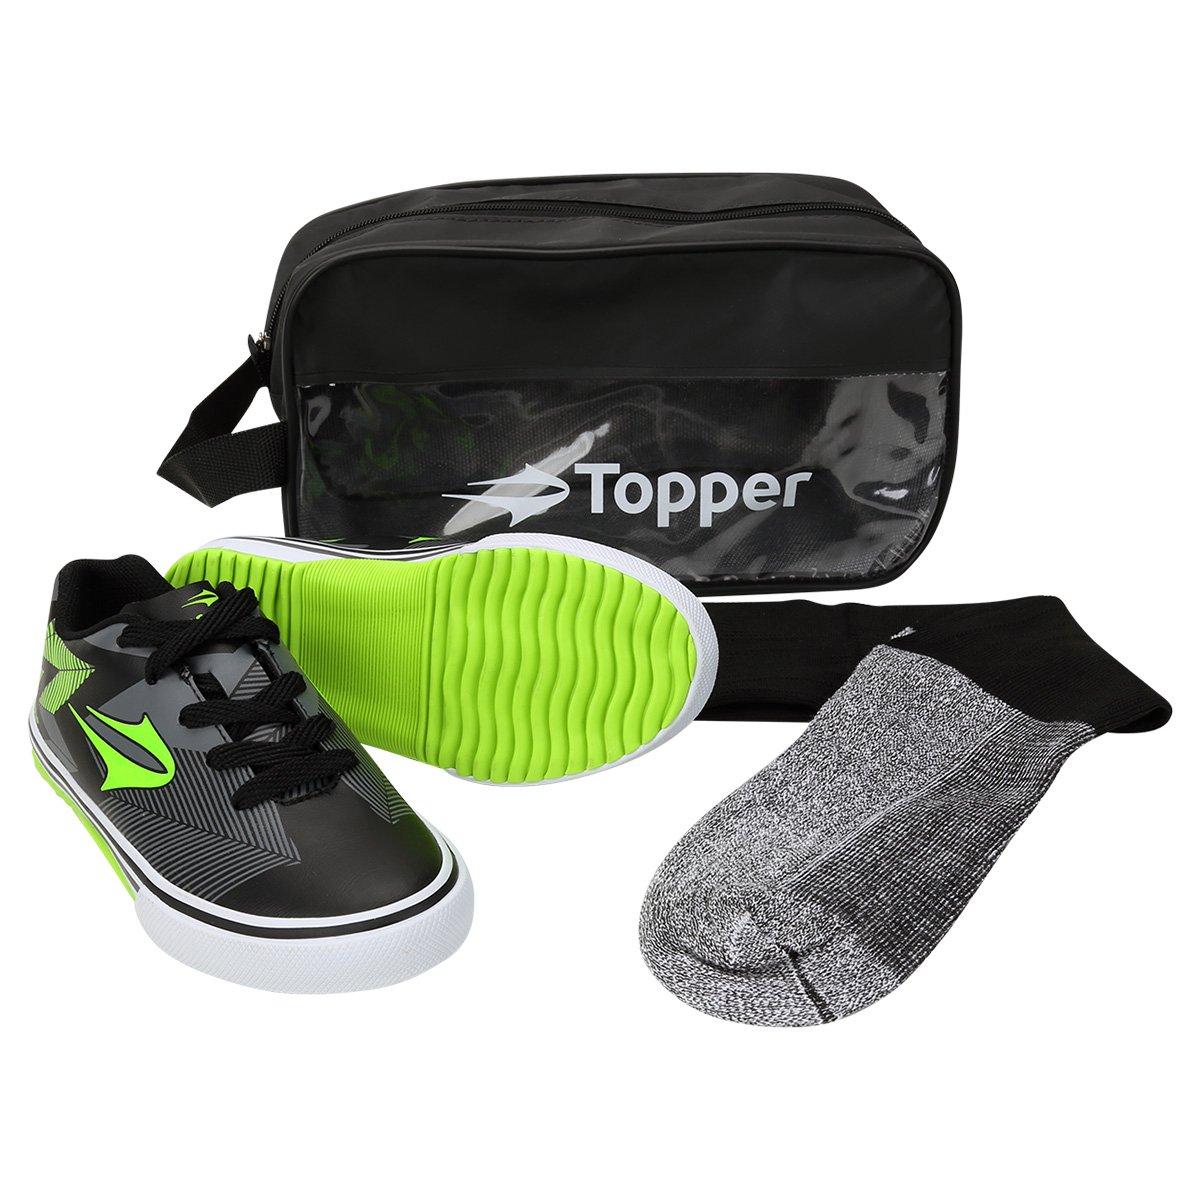 dfeea87130 Kit Topper Goleada Chuteira Futsal com Meião 1 Infantil